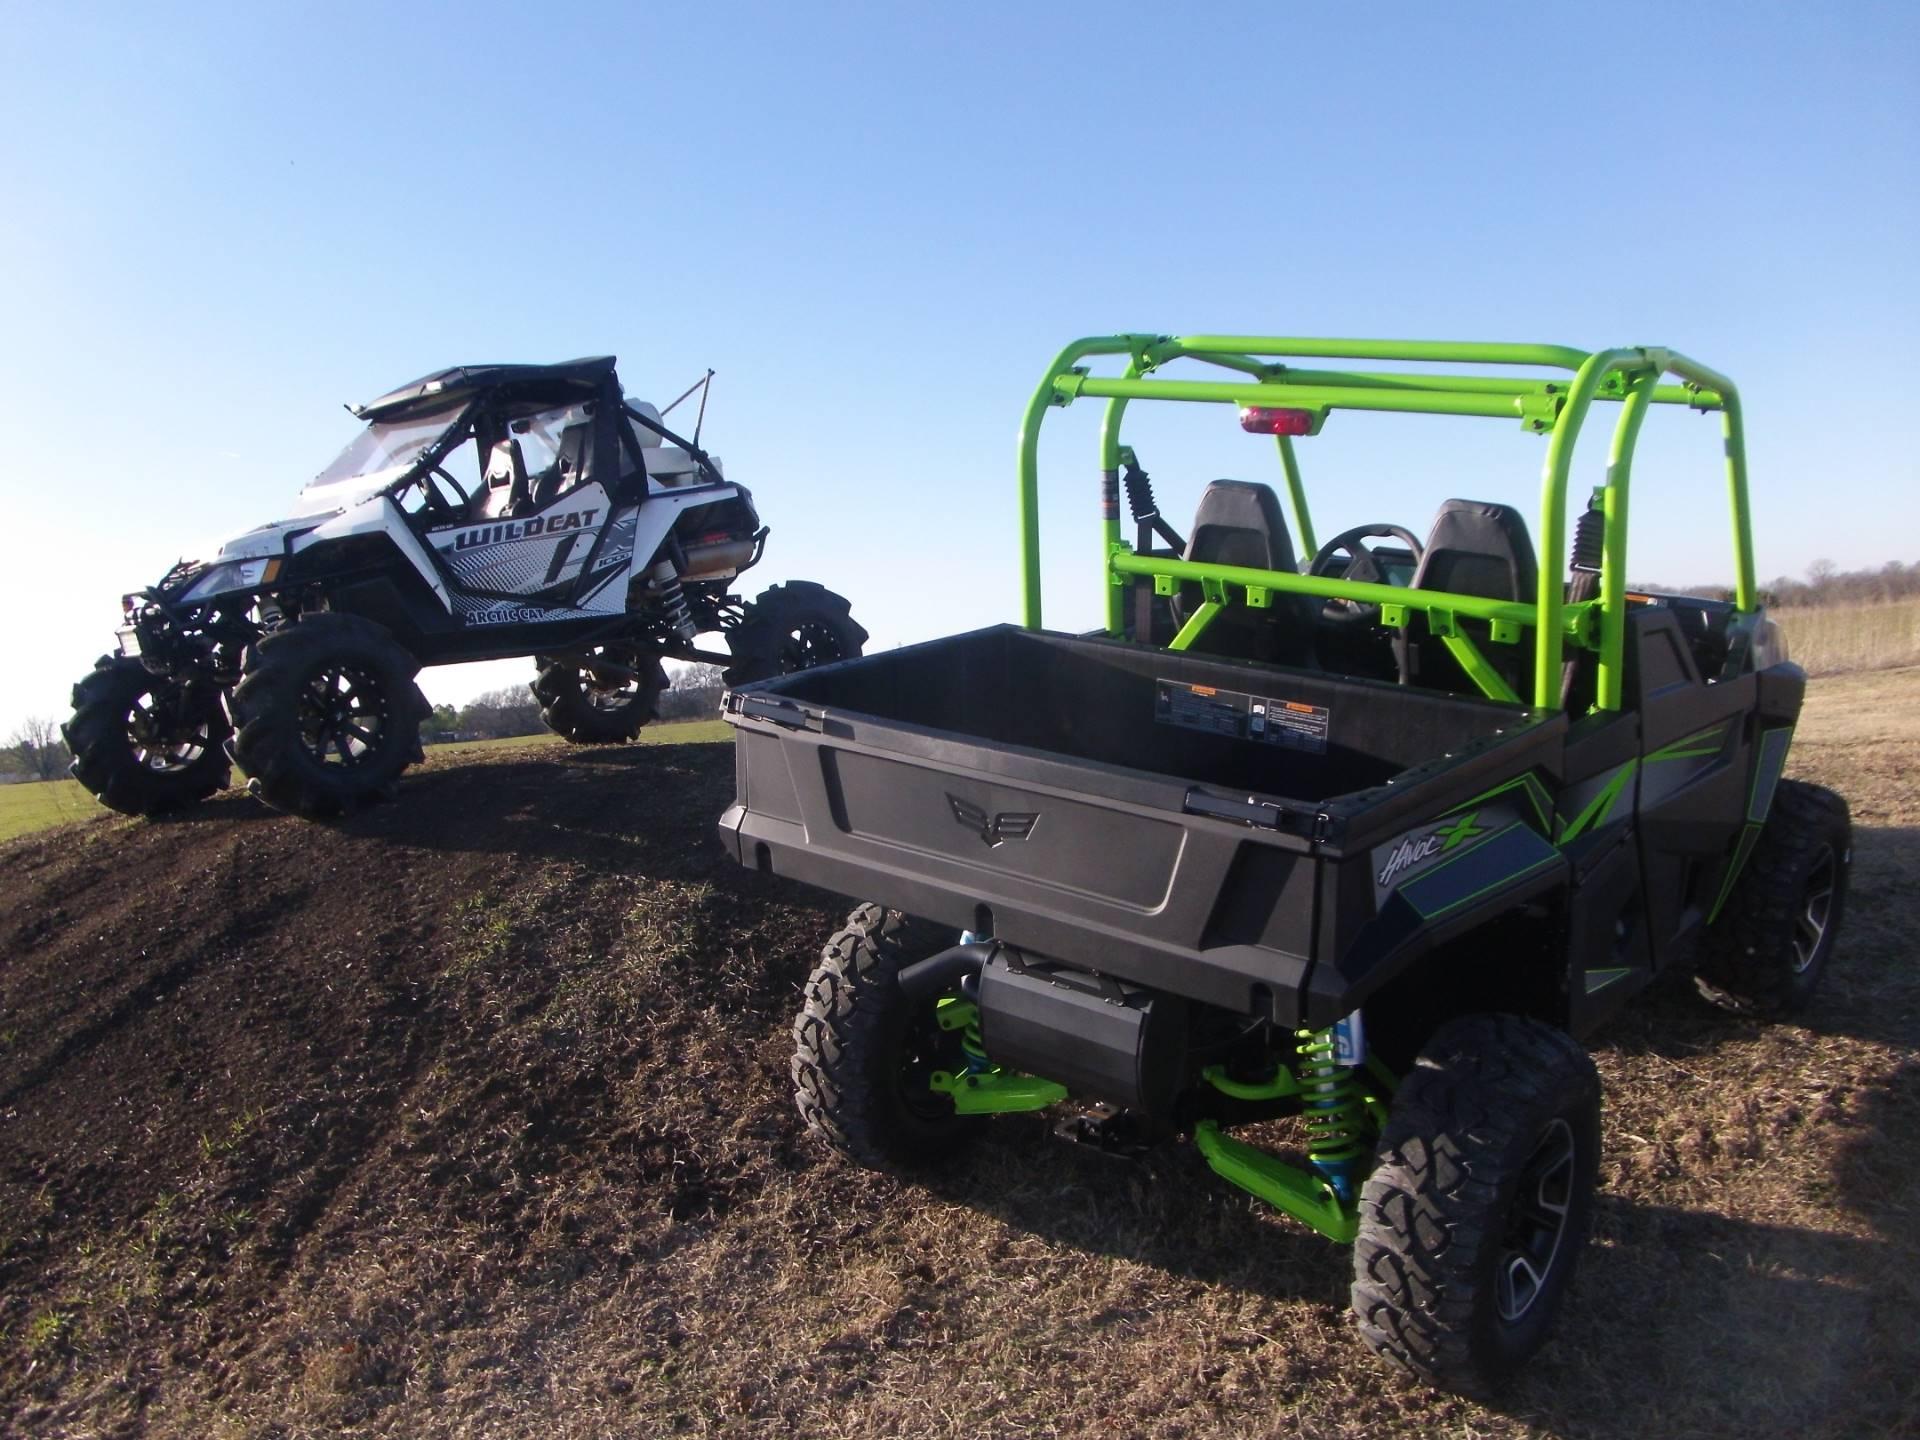 2018 Textron Off Road Havoc X in Melissa, Texas